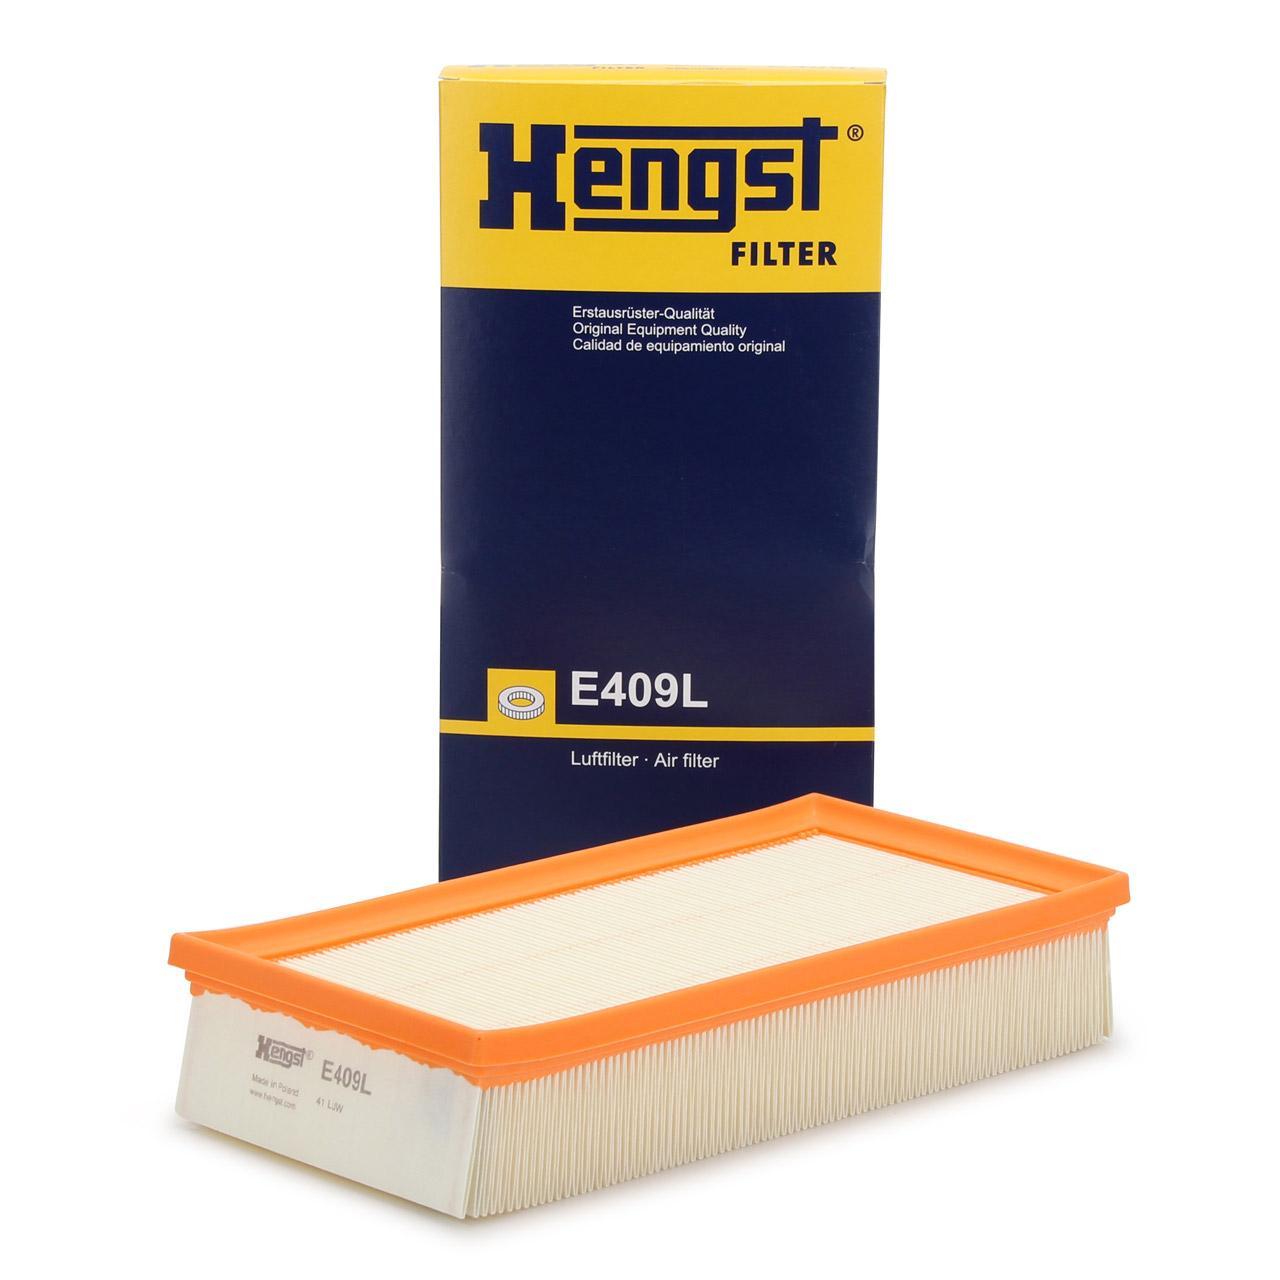 HENGST E409L Luftfilter für BMW 7er E38 750i 326 PS + X5 E53 3.0i 231 PS